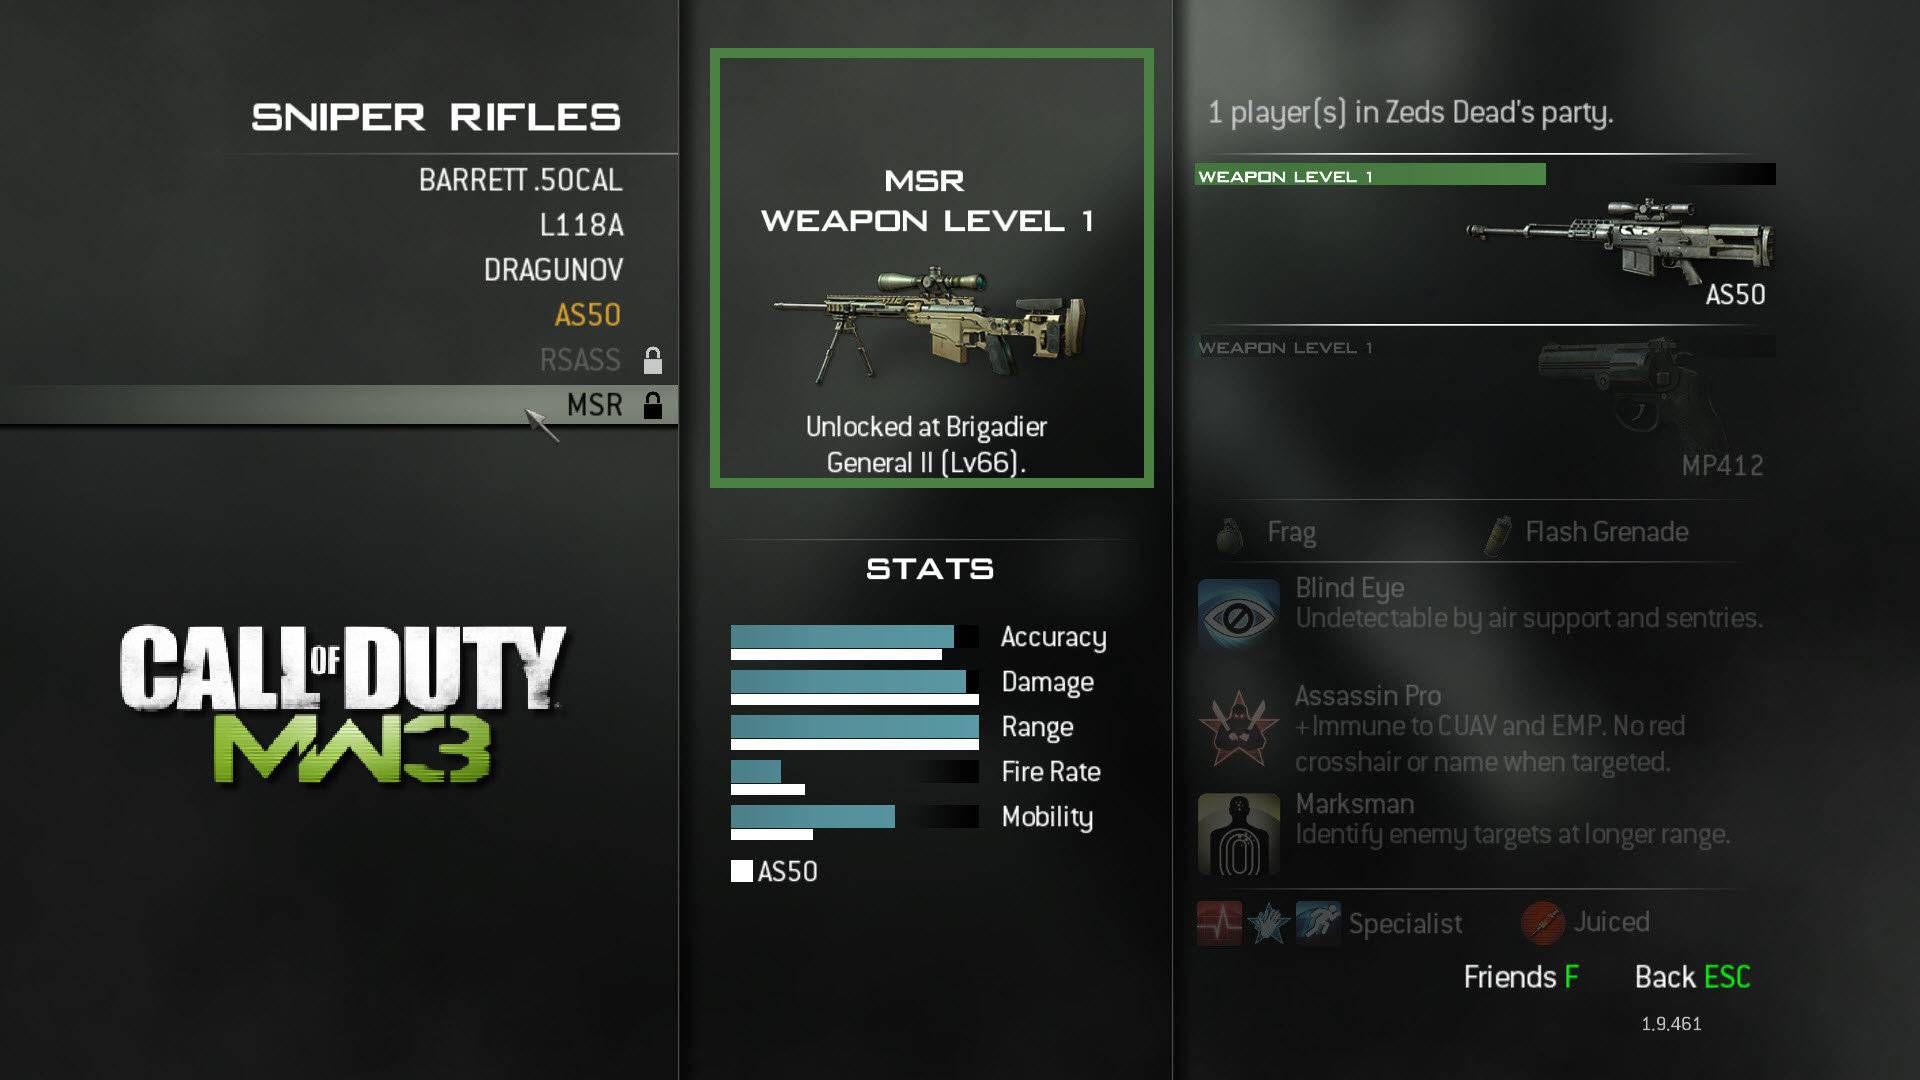 Modern Warfare 3 Sniper Weapon MSR